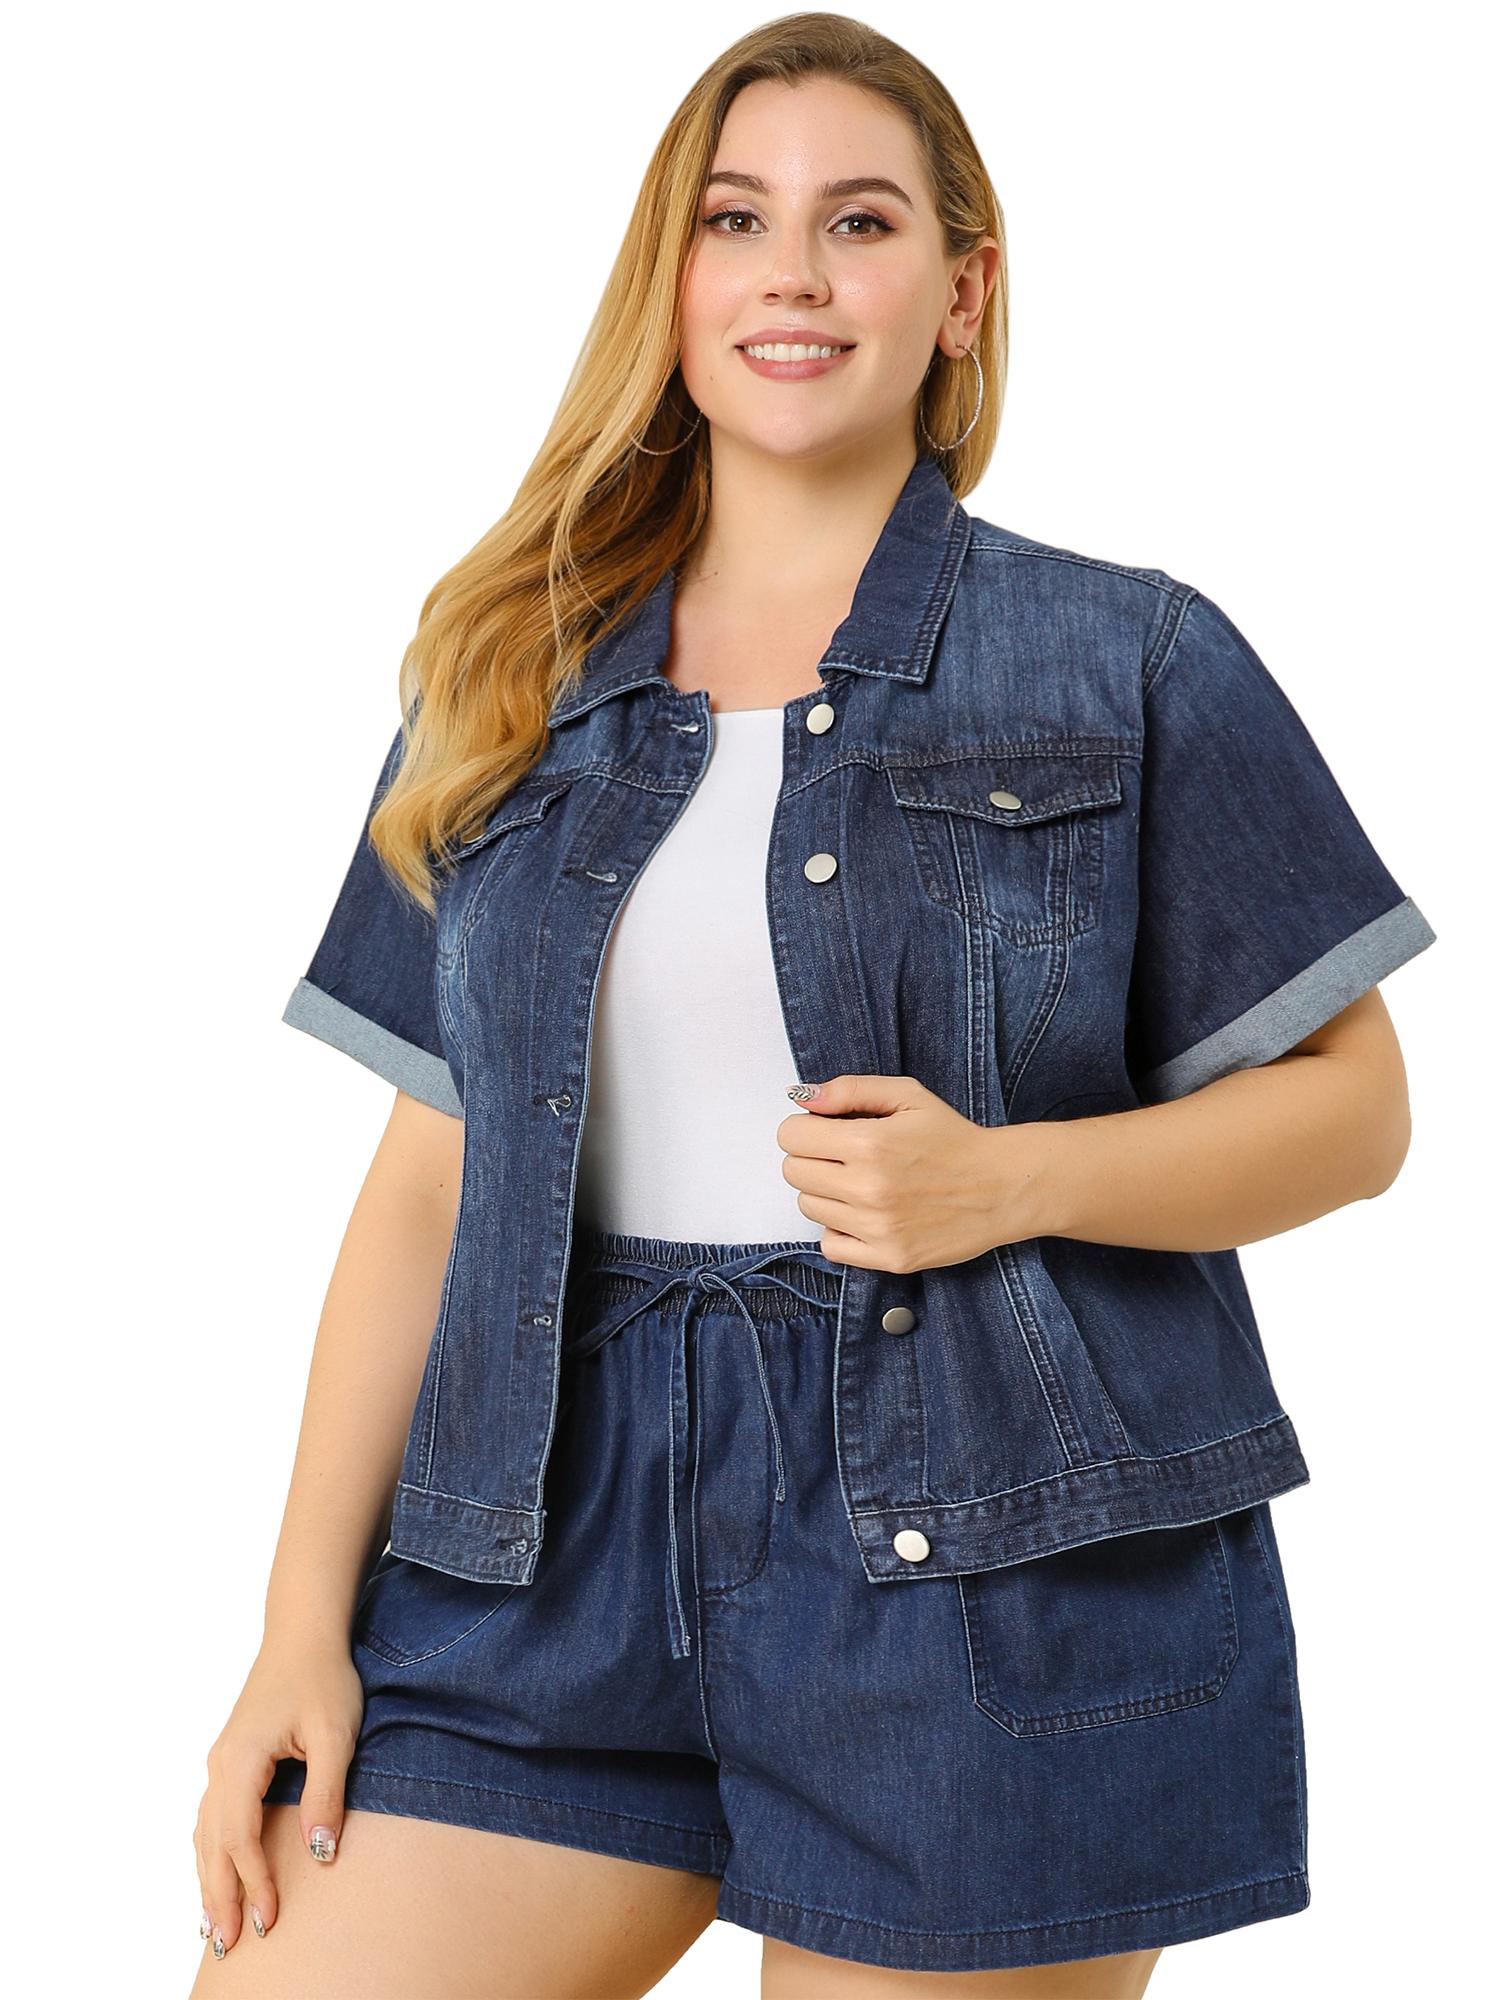 thumbnail 7 - Women's Plus Size Denim Jacket Button Crop Short Sleeve Jackets